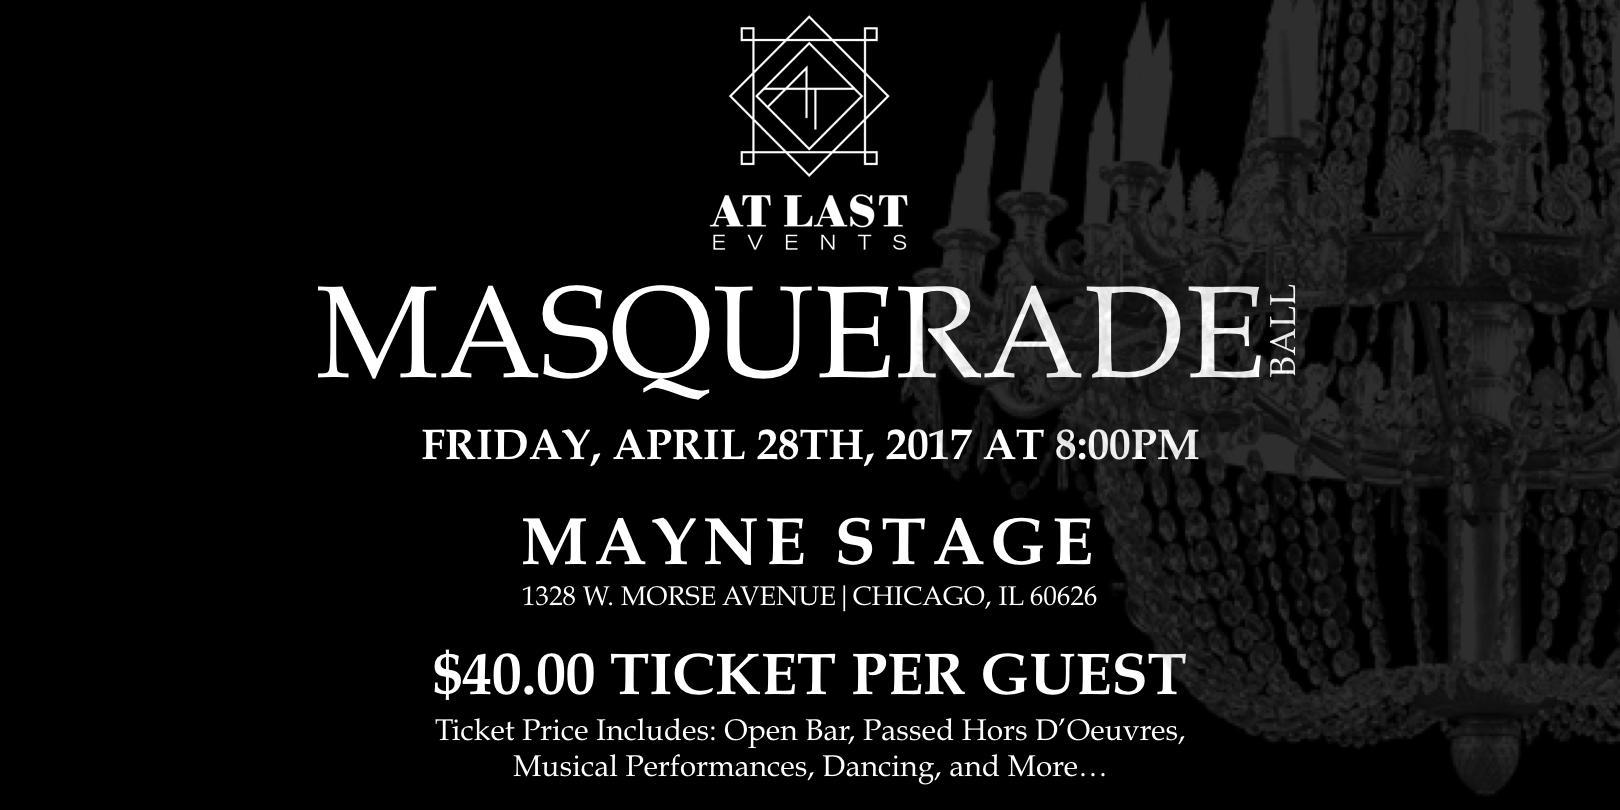 AT LAST EVENTS Masquerade Ball